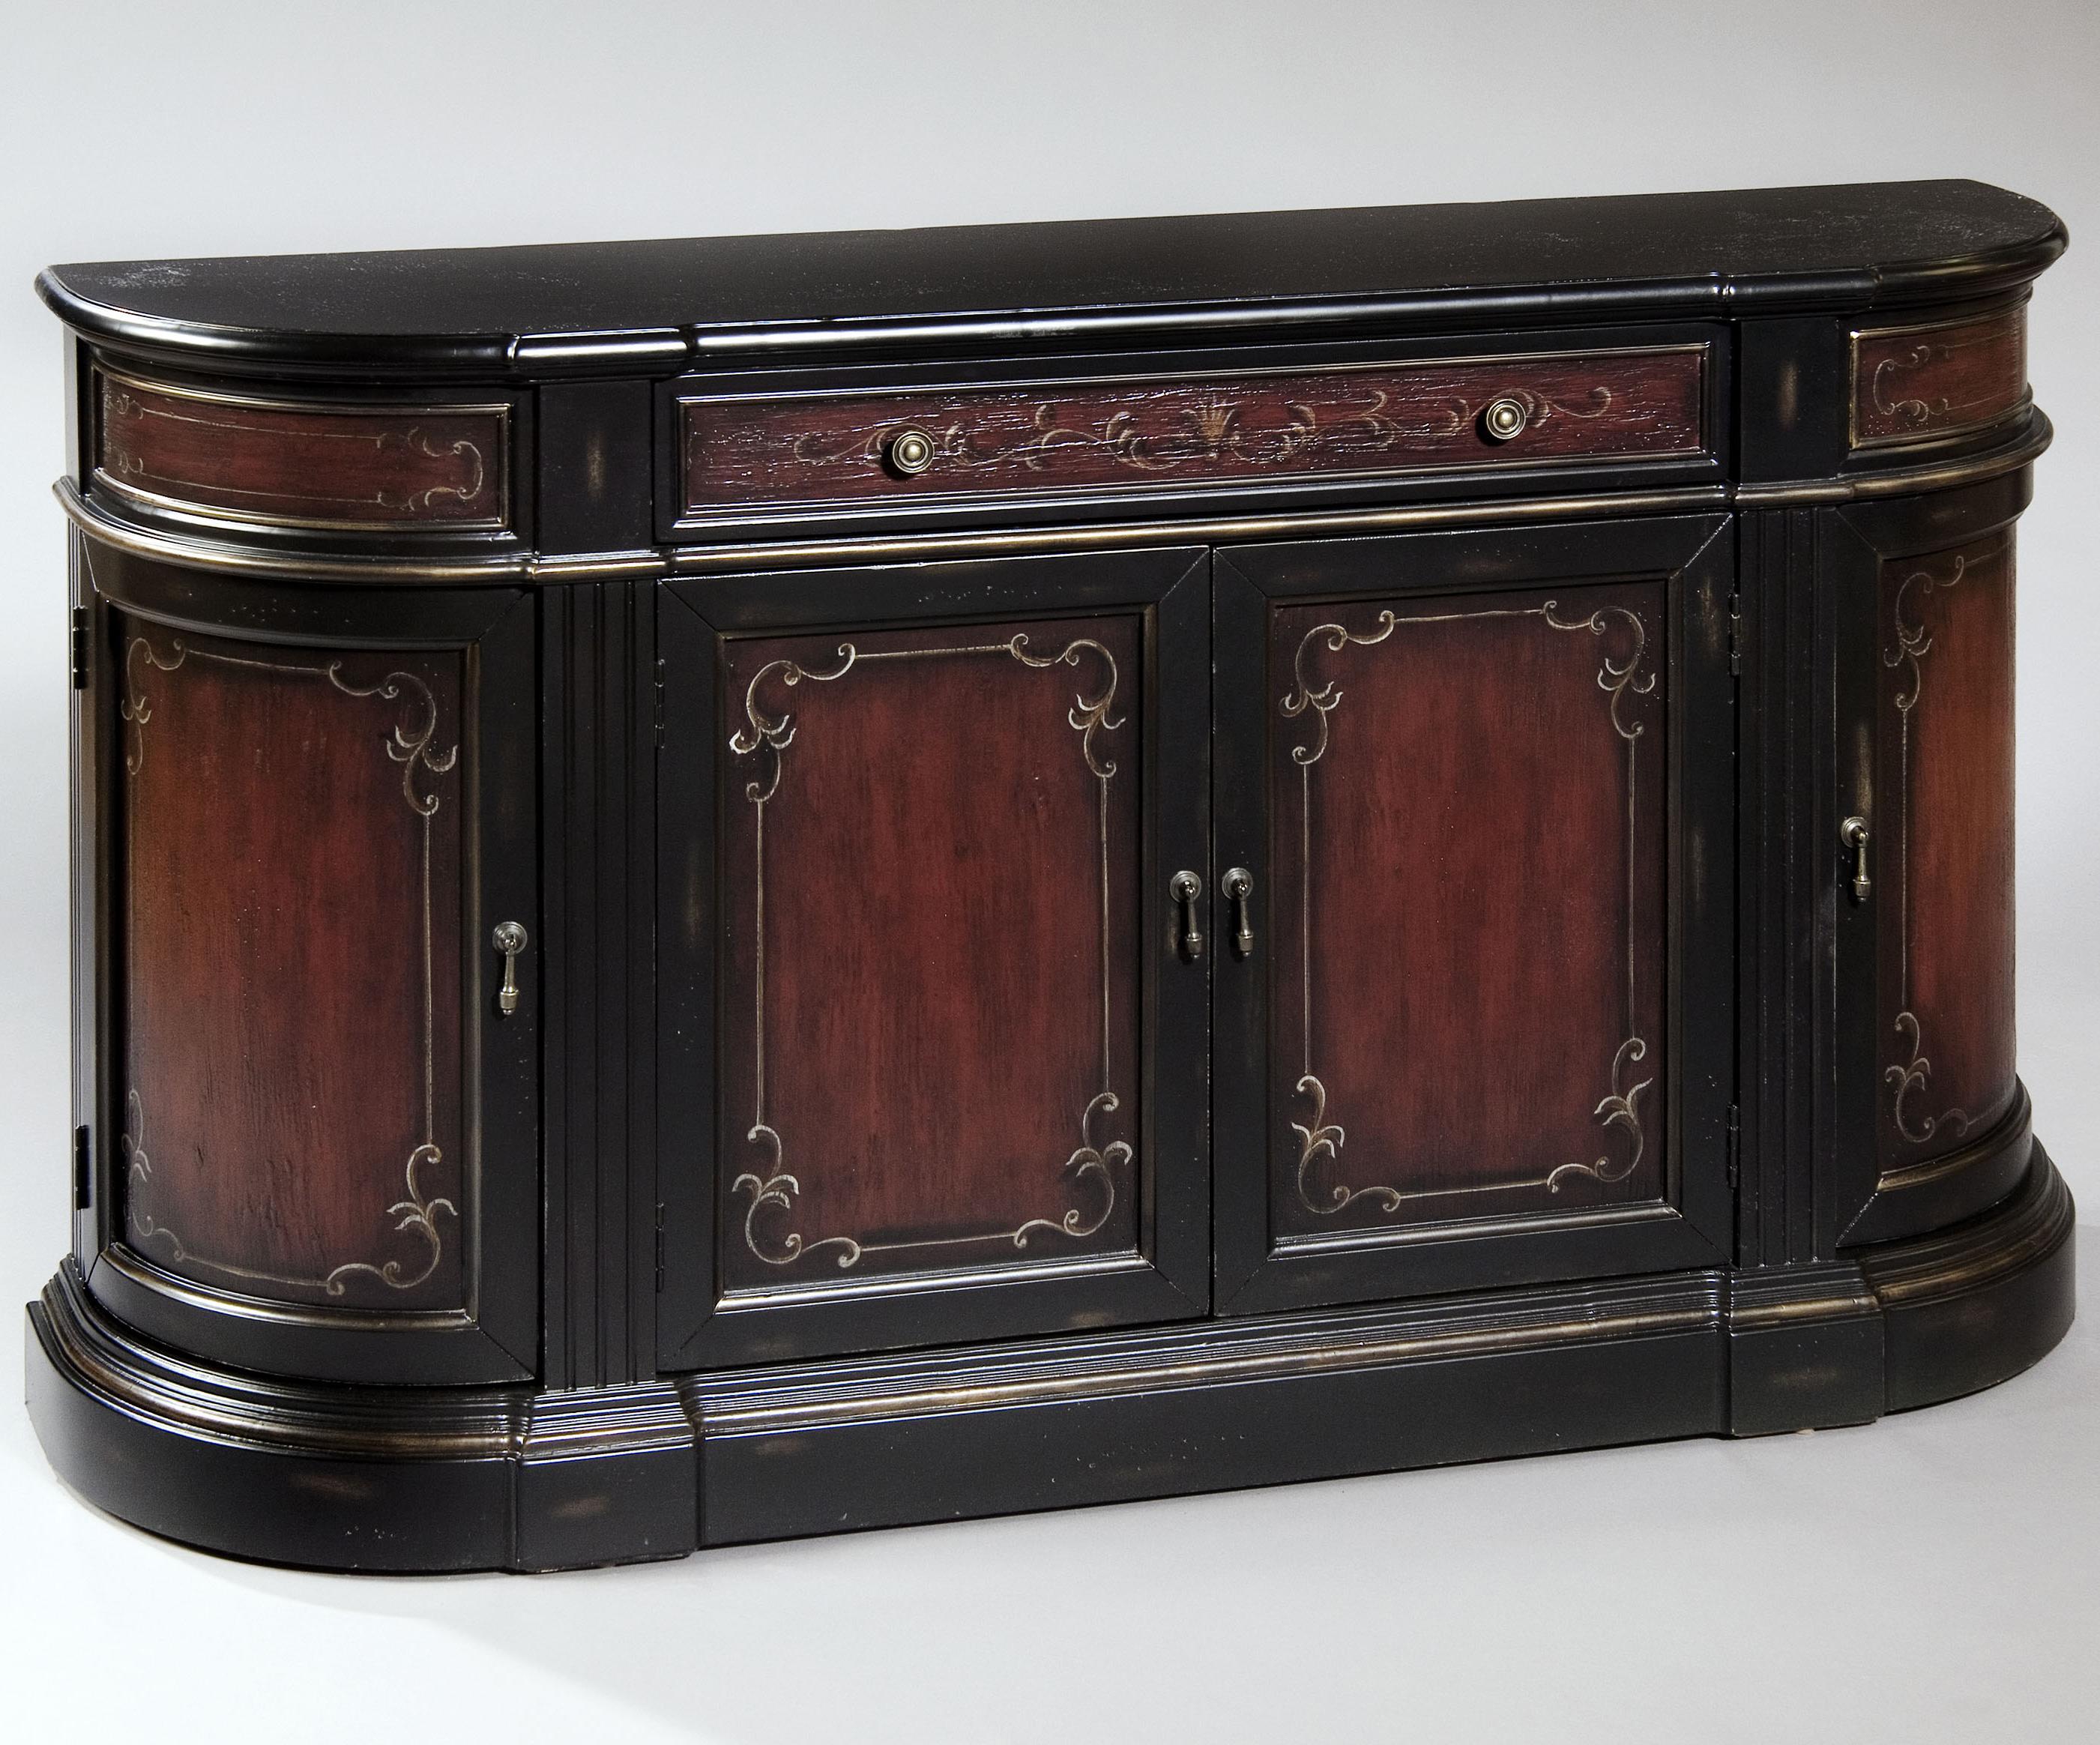 Pulaski Furniture Accents Credenza - Item Number: 969132